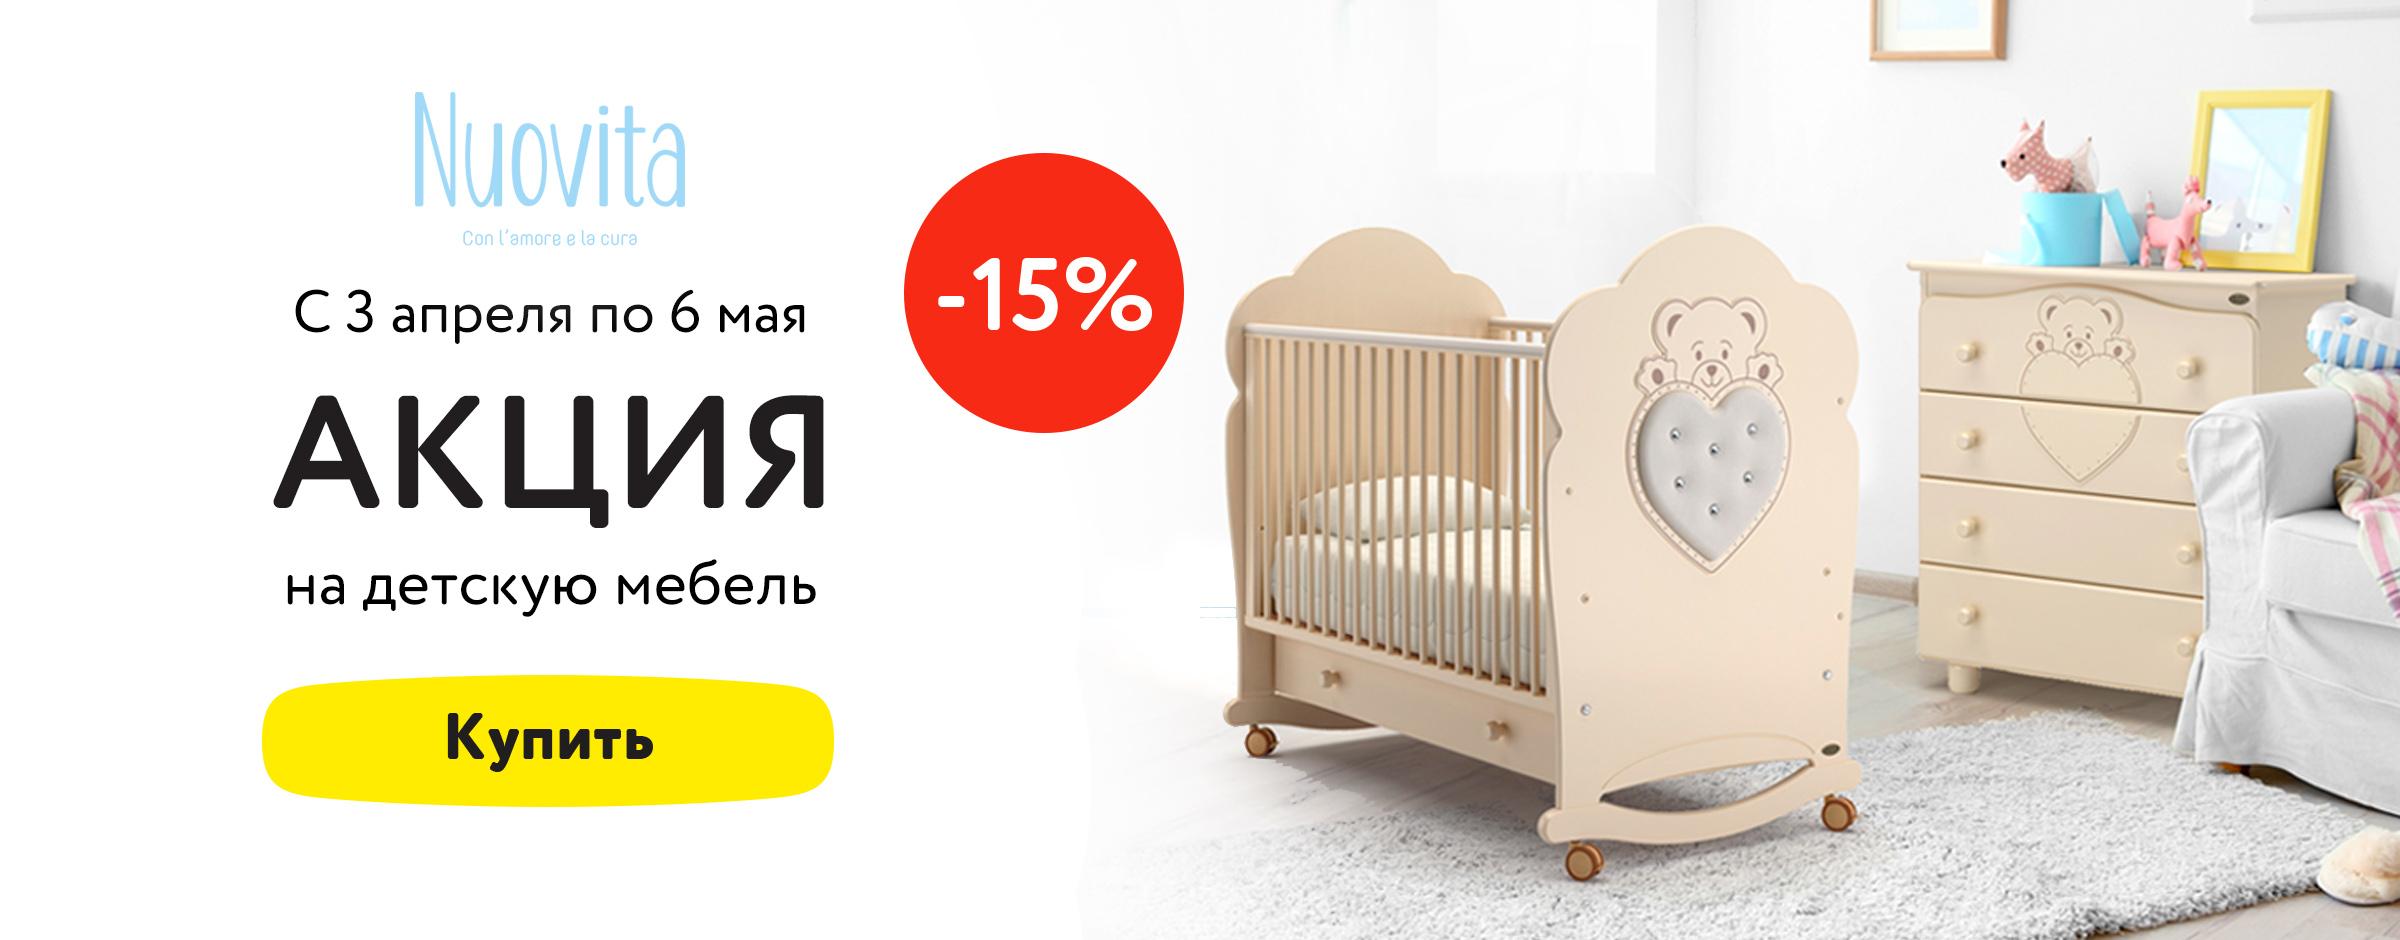 15% на мебель Nuovita